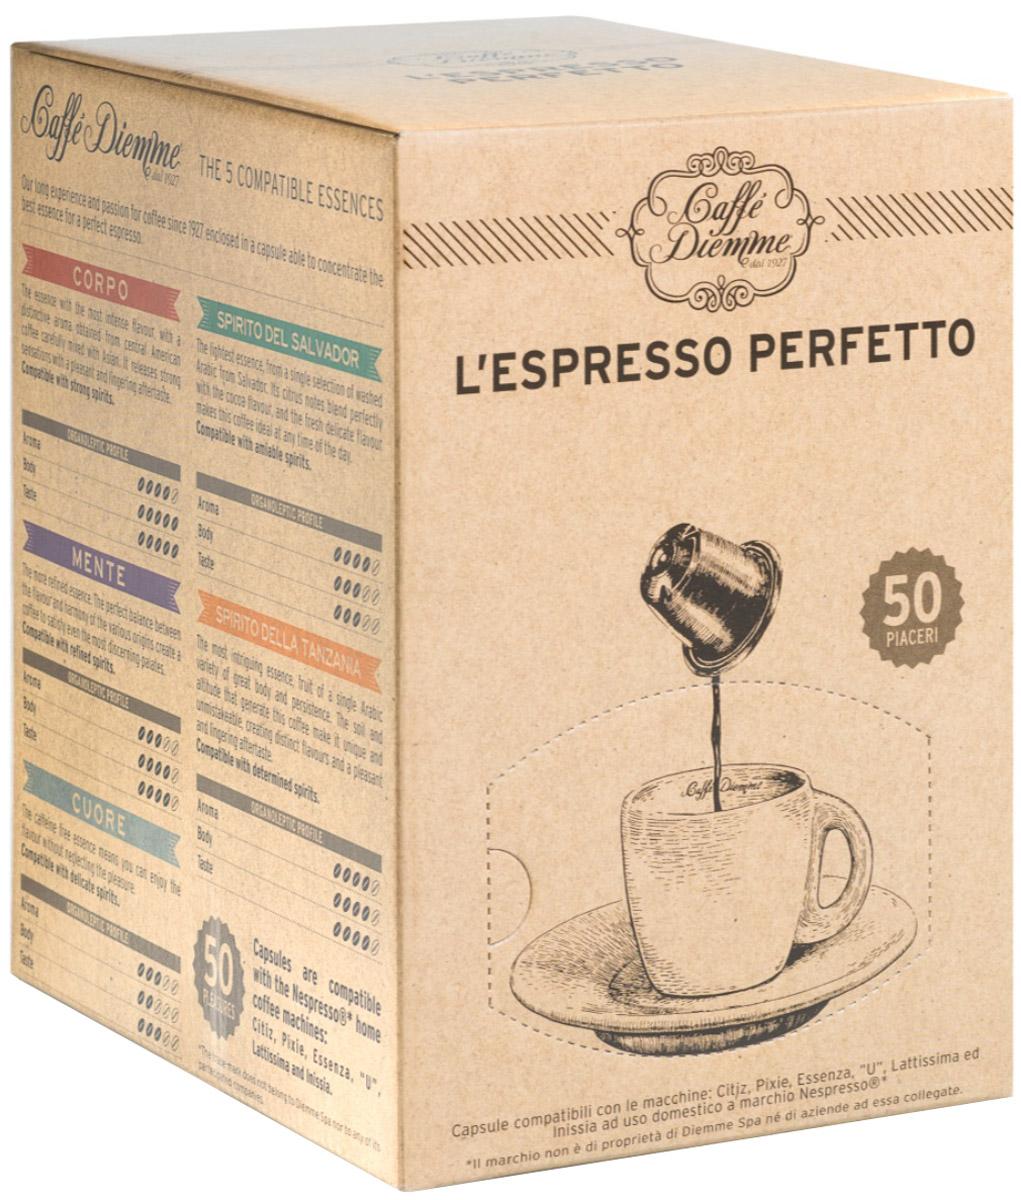 Diemme Caffe Spirito della Tanzania кофе в капсулах, моносорт, 50 шт corporate real estate management in tanzania